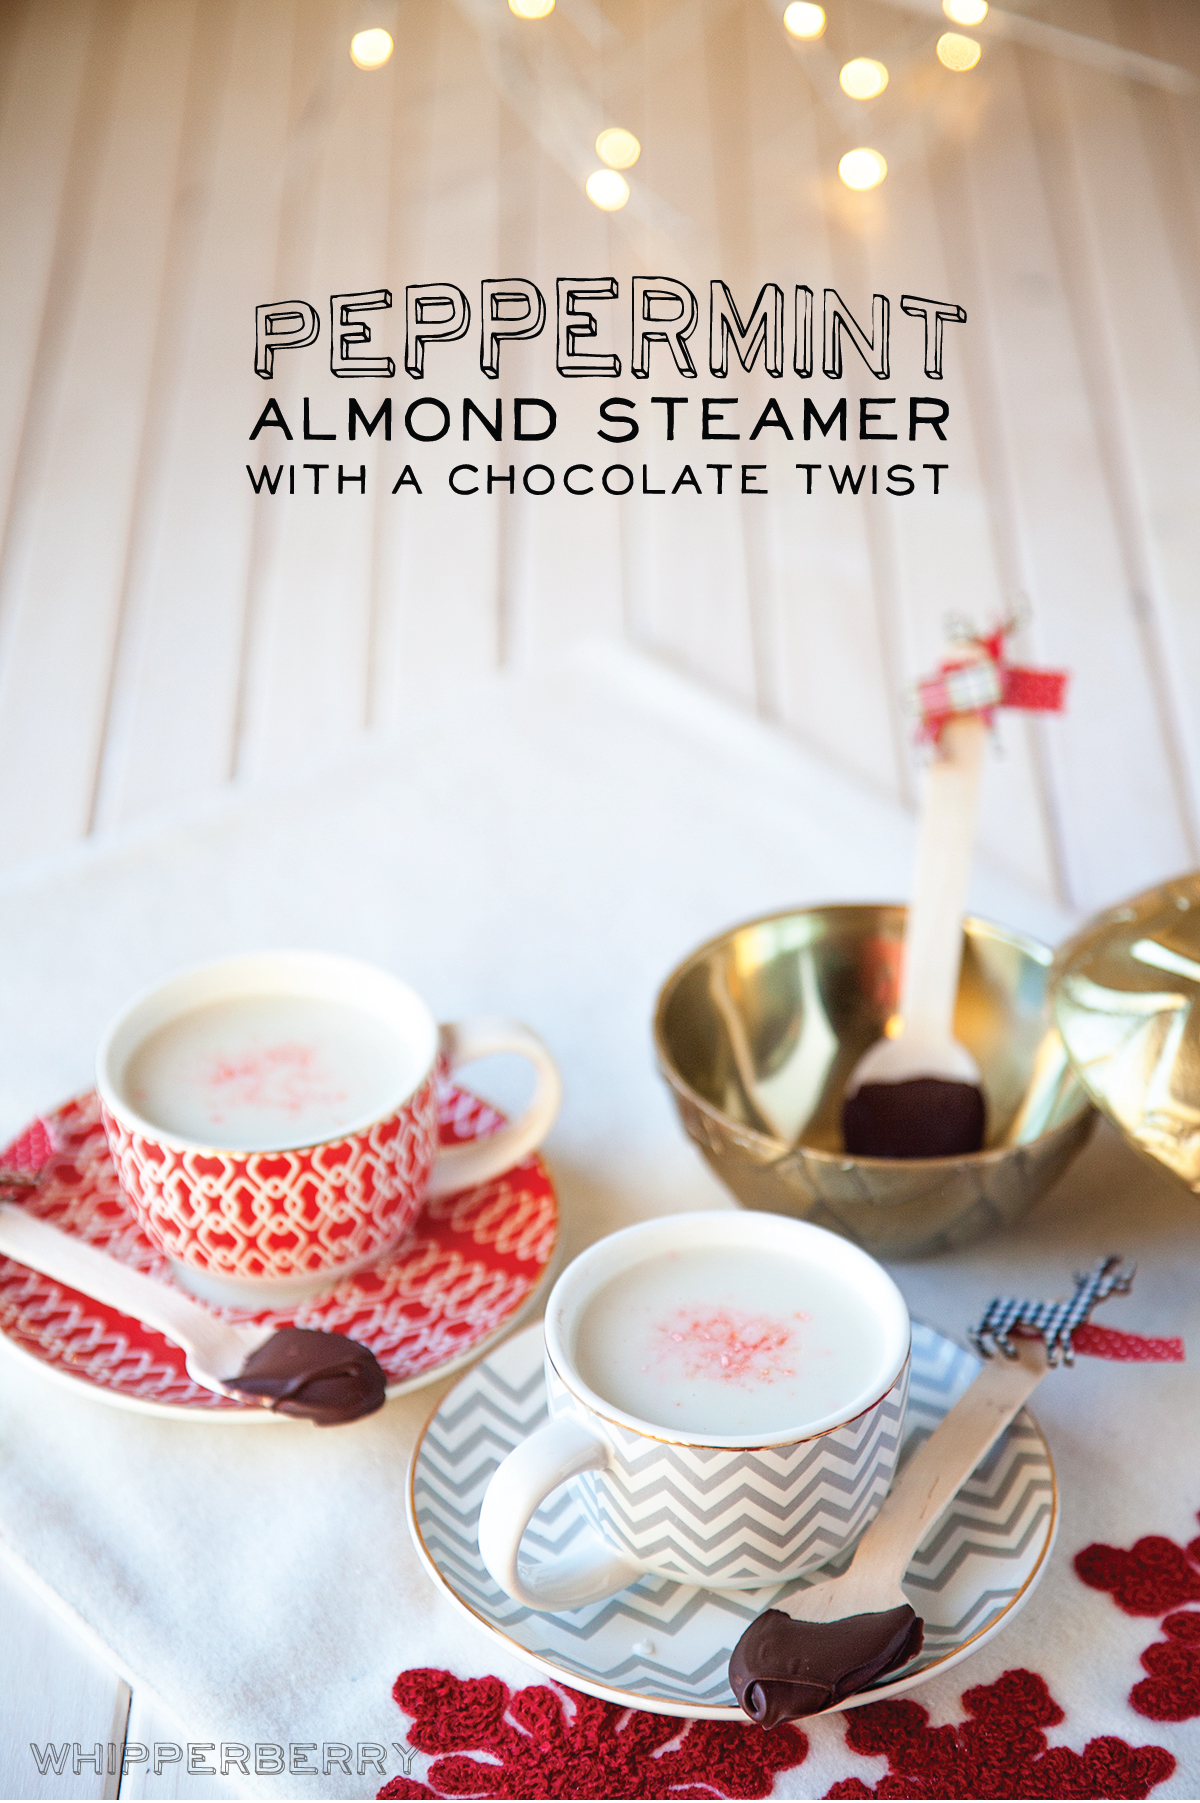 1200-Silk-Almond-Milk-Peppermint-Steamer-from-WhipperBerry-7